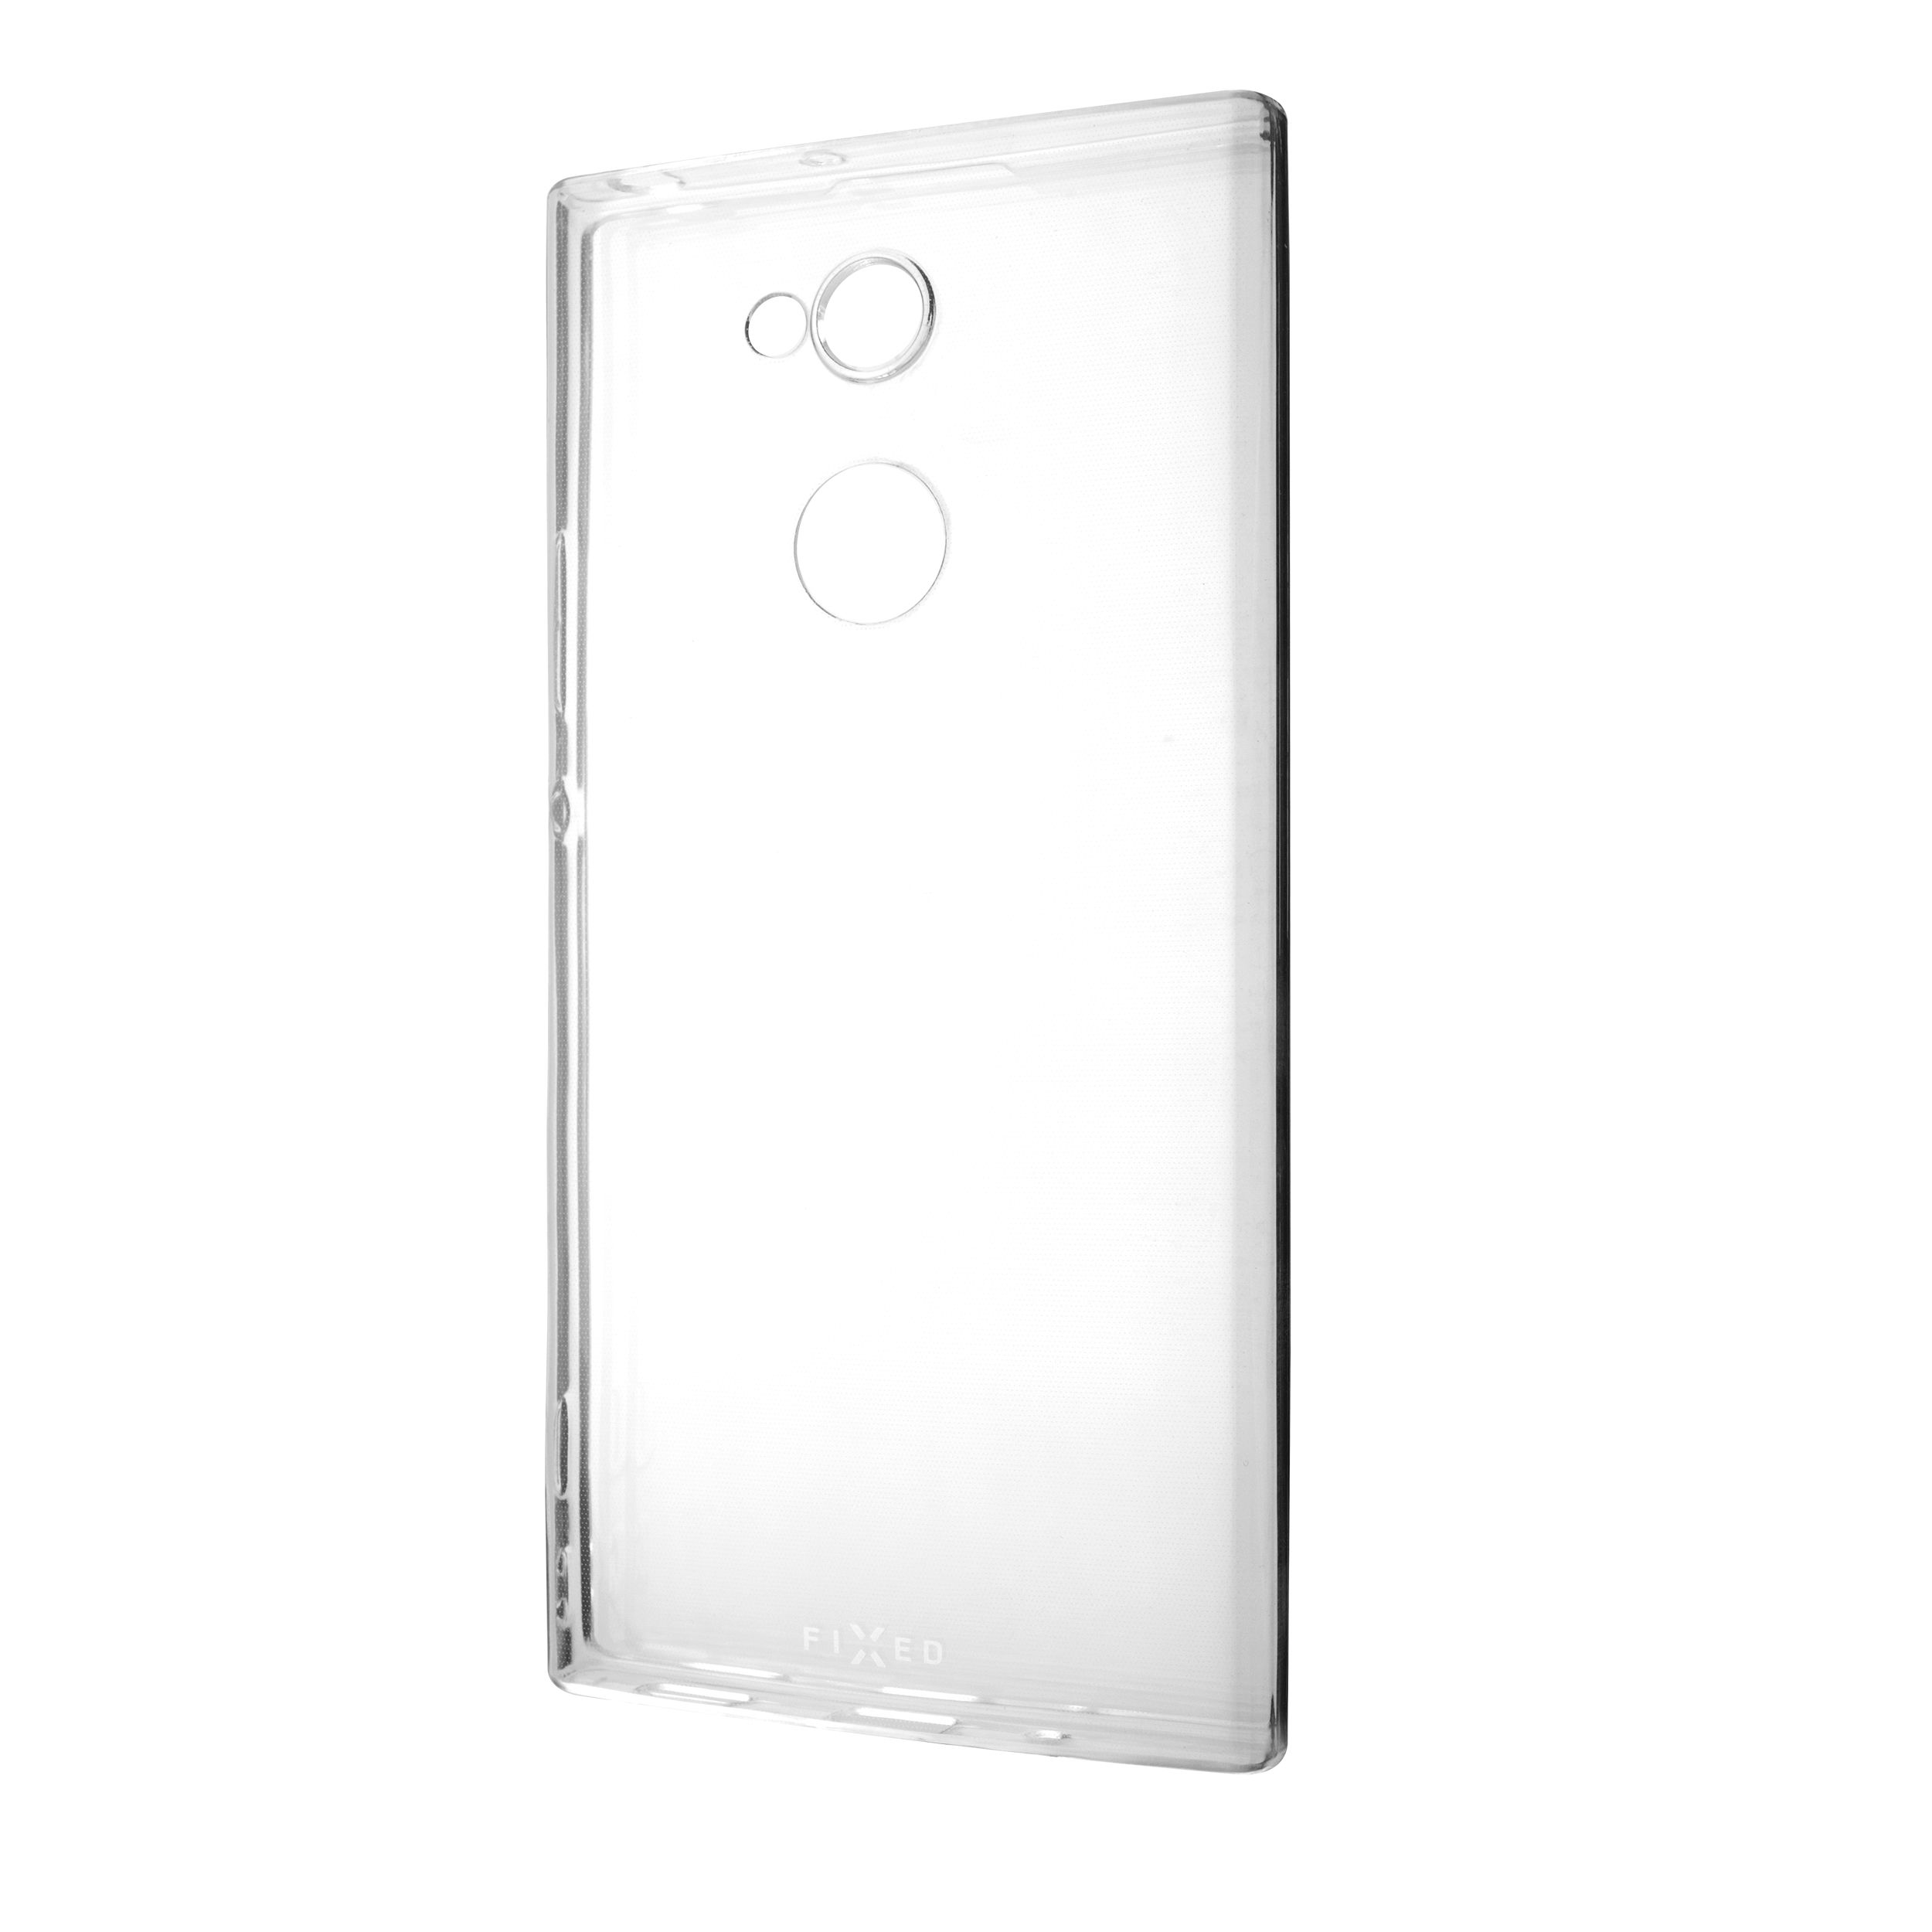 Silikonové pouzdro FIXED pro Sony Xperia XA2 Ultra, čiré